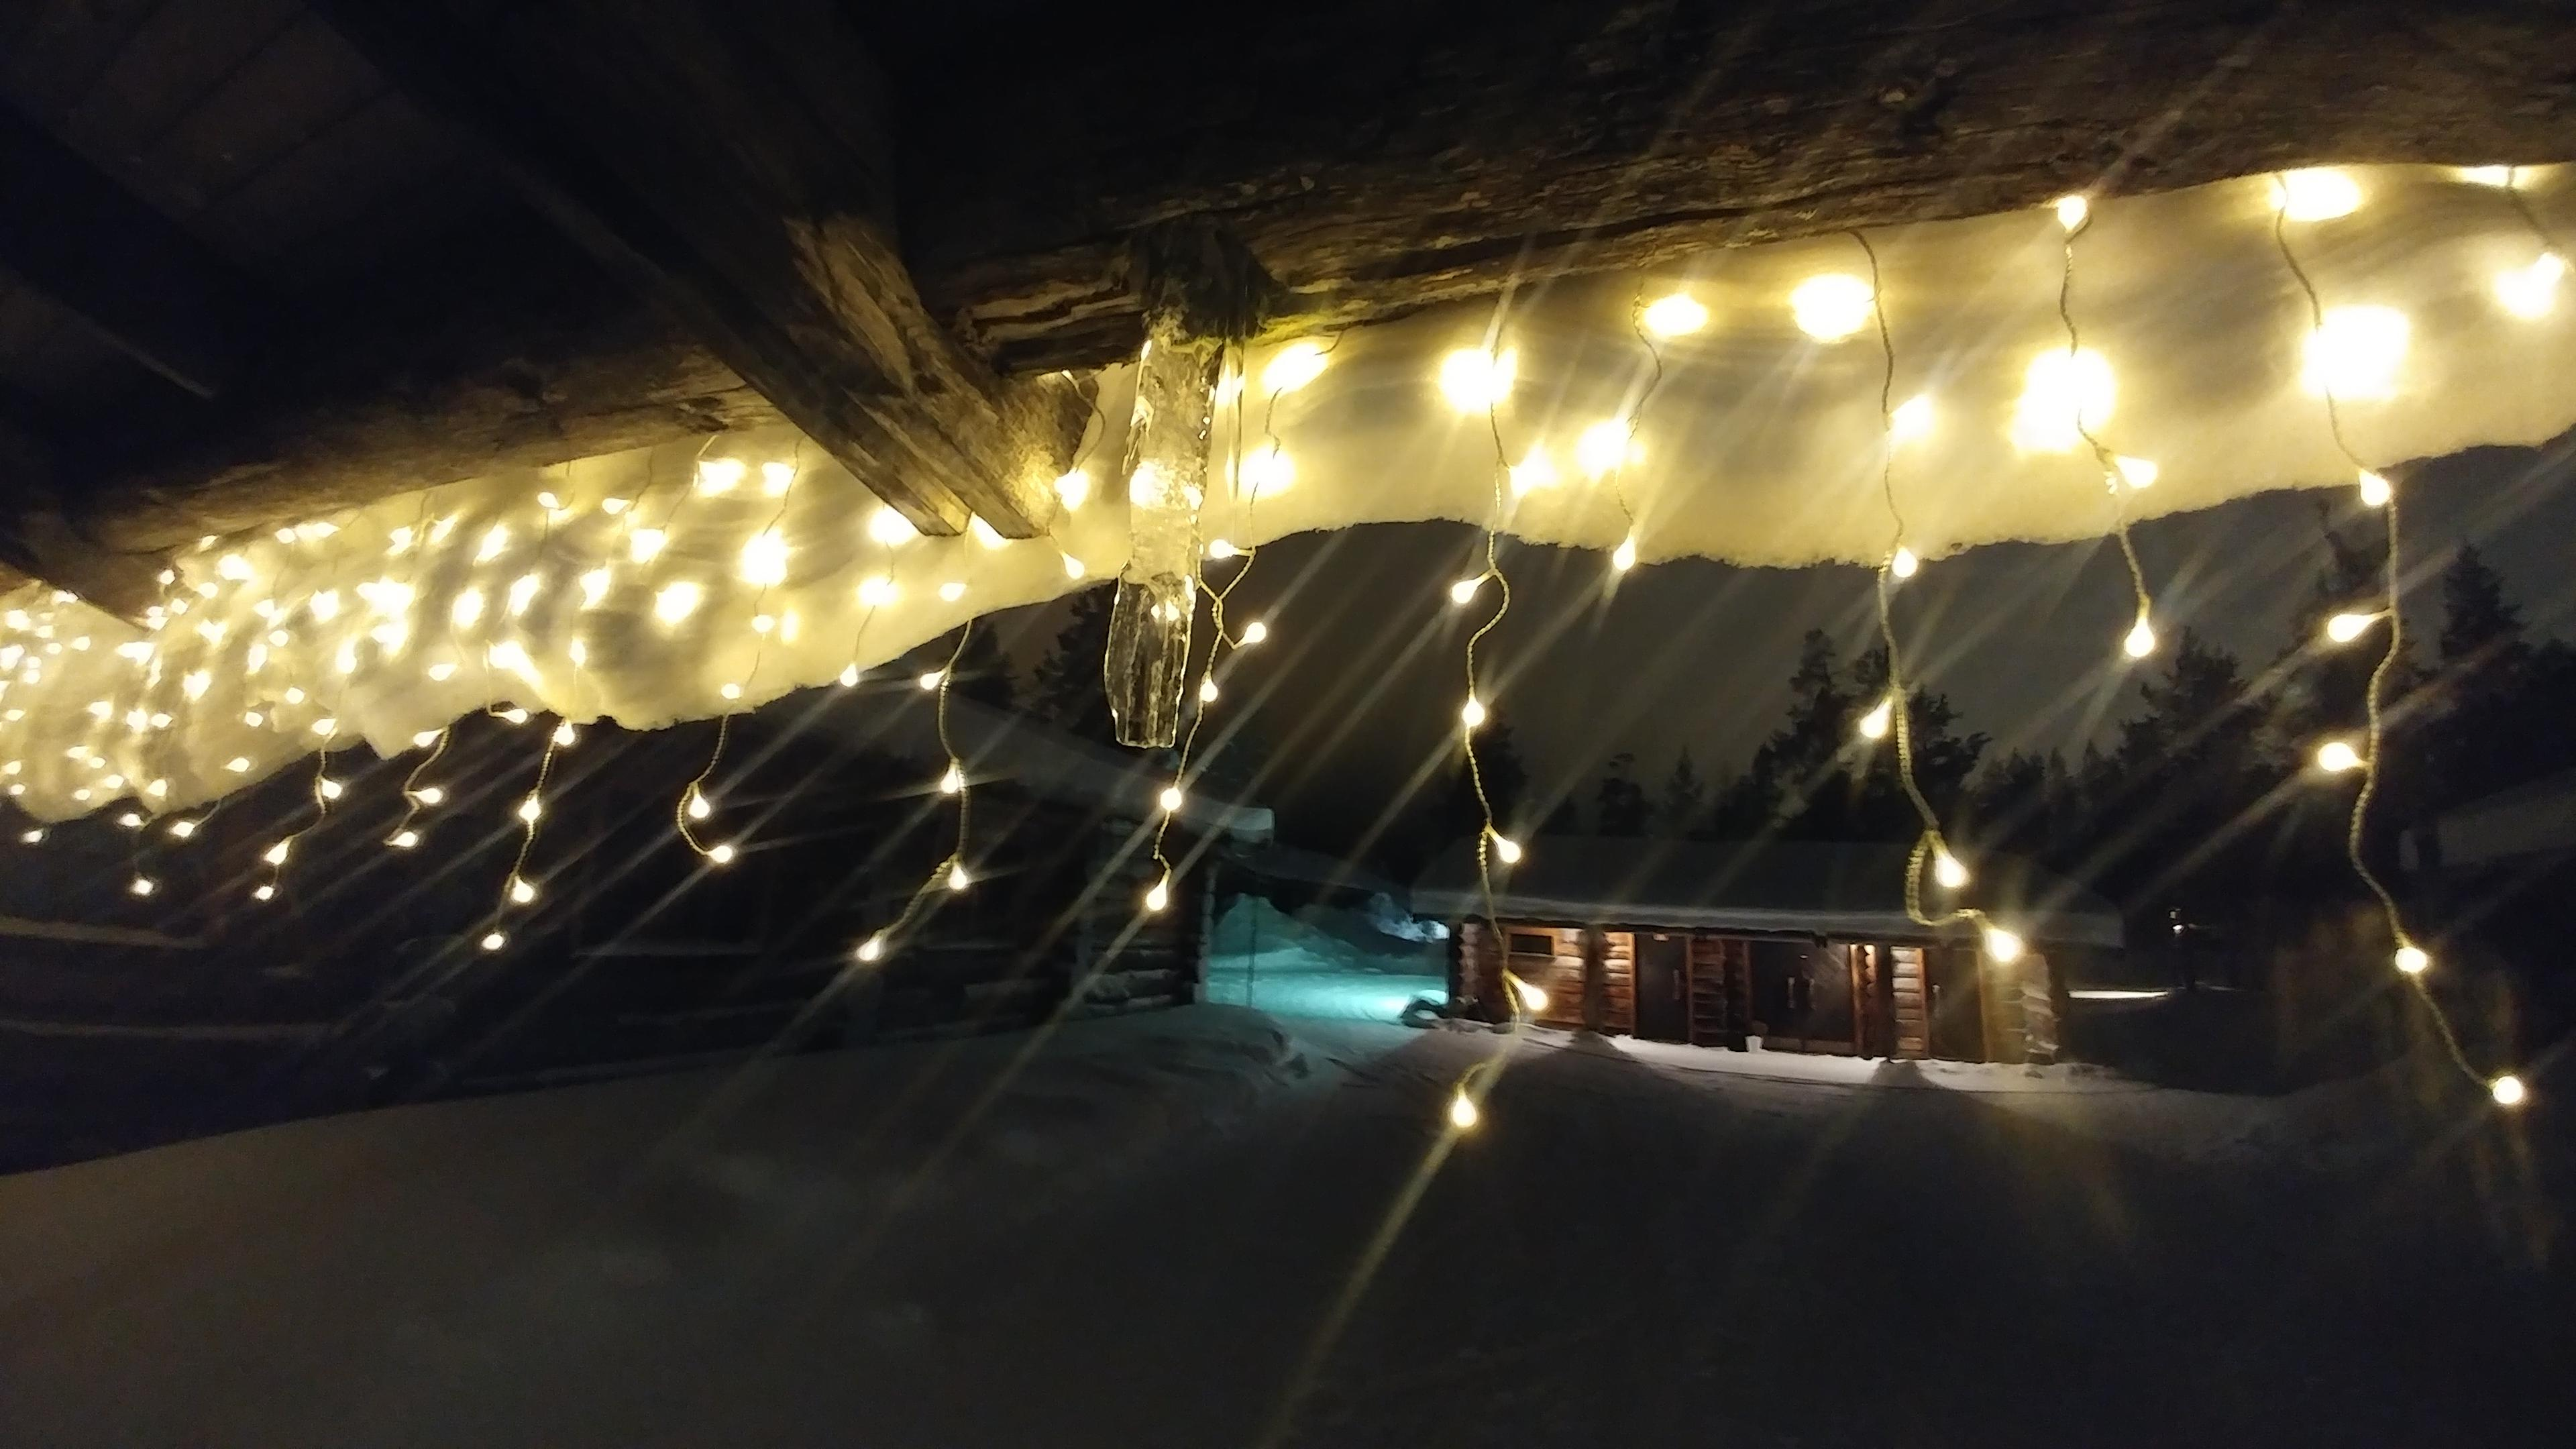 Lodge Kuukkeli Porakka: 2019 Room Prices $70, Deals